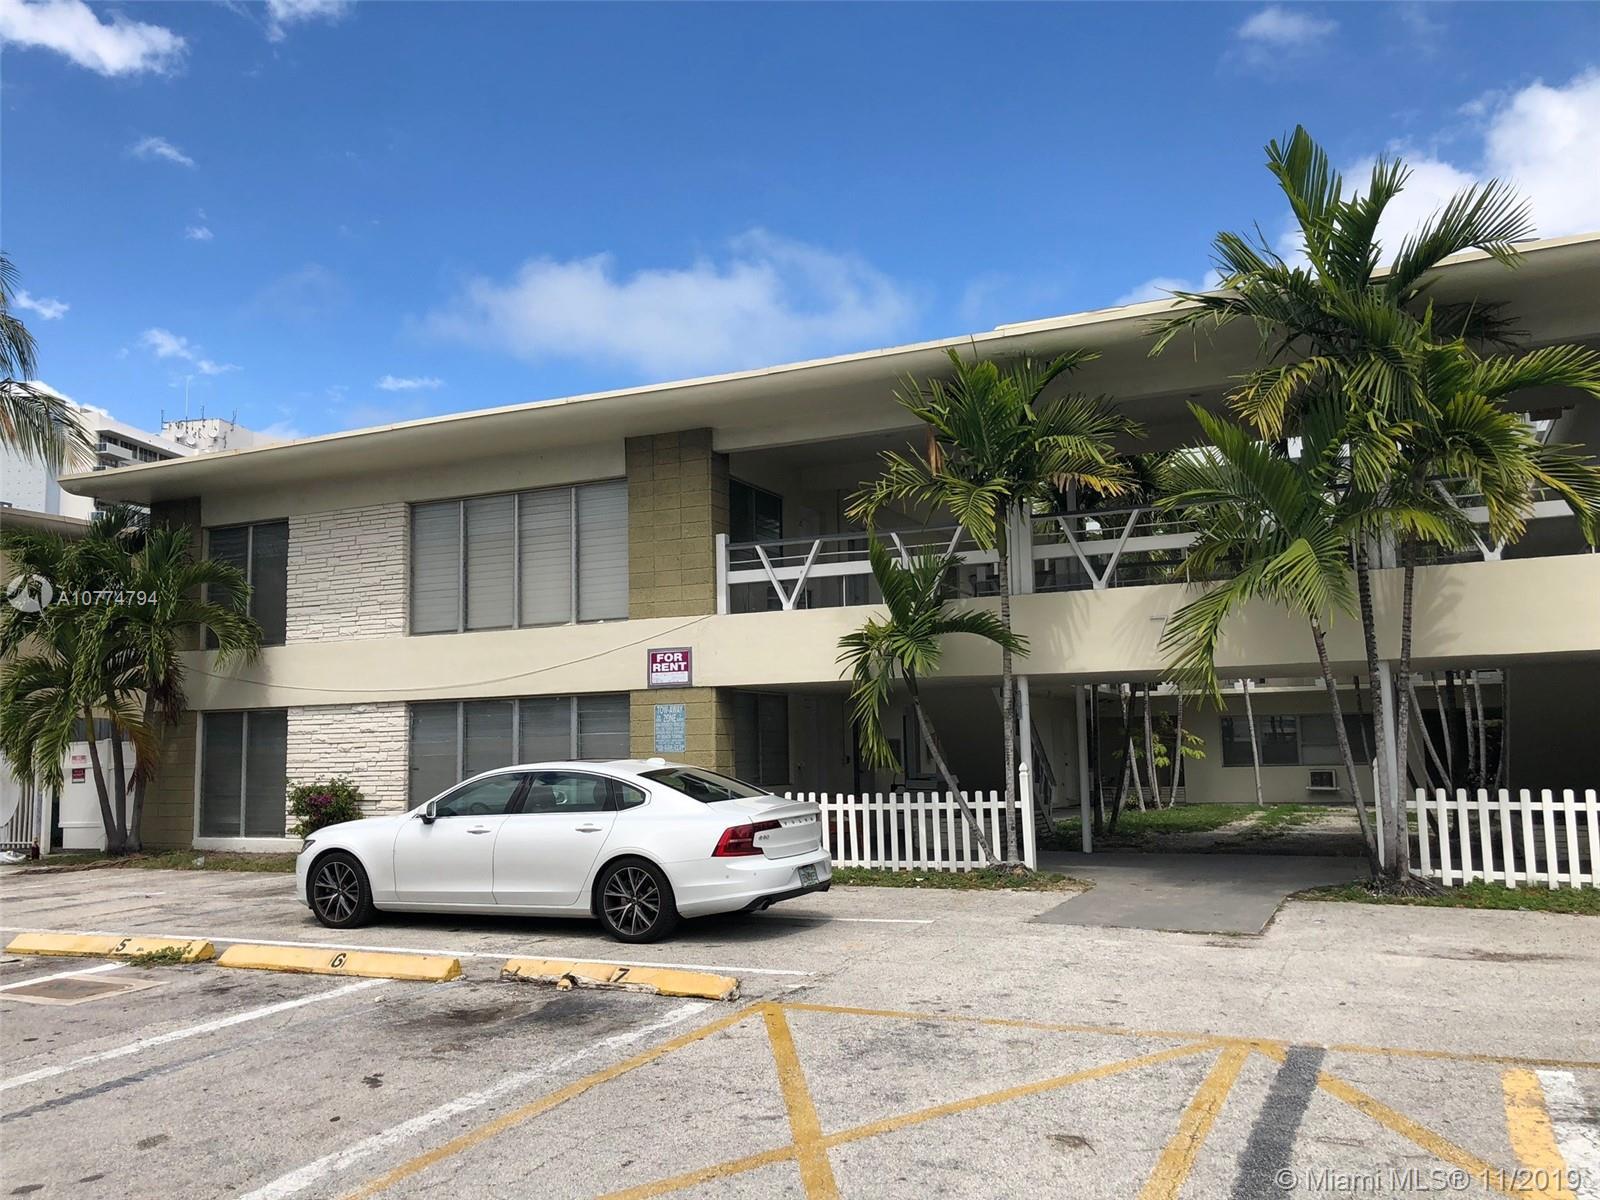 7311 Gary Ave - Miami Beach, Florida